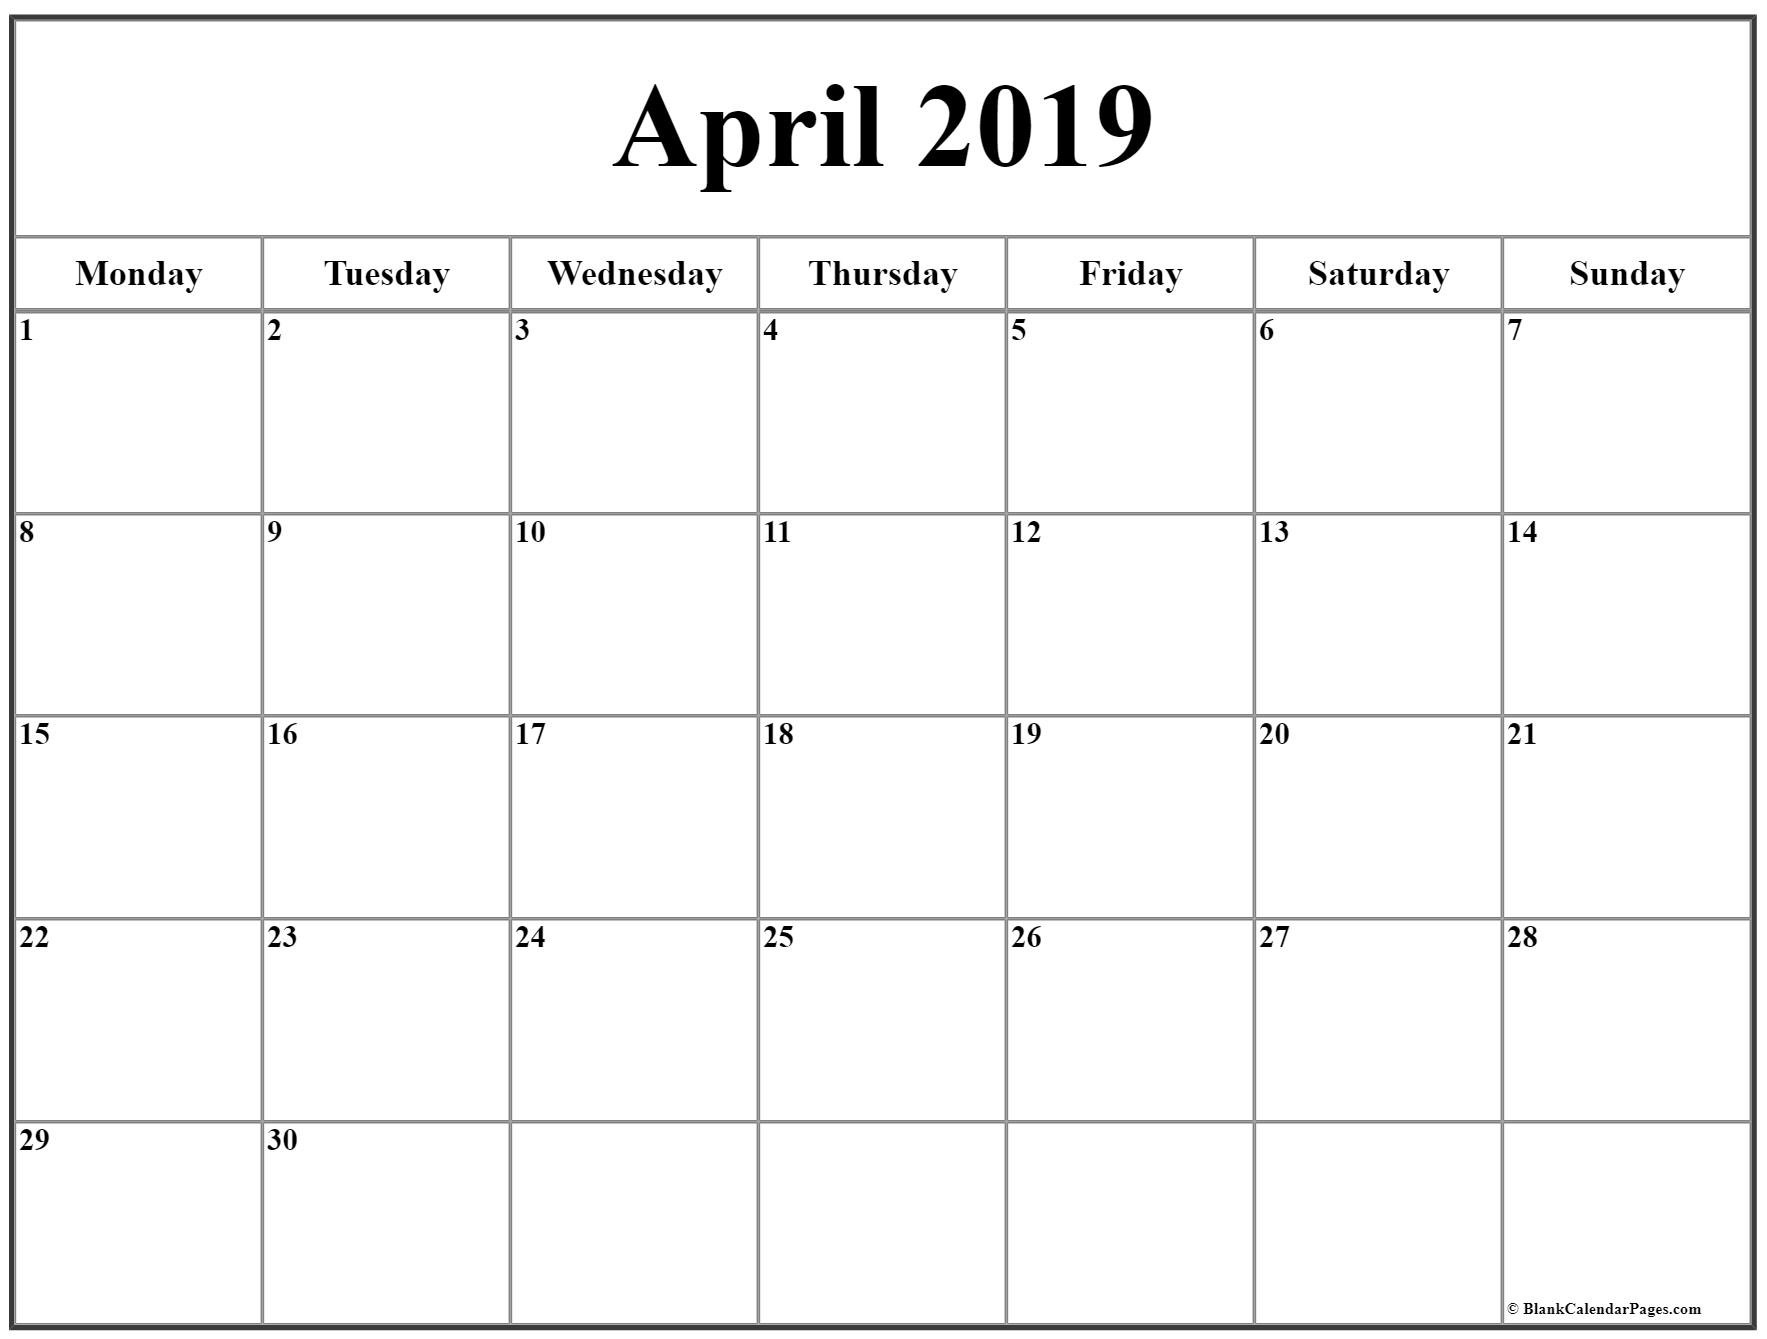 April 2019 Monday Calendar | Monday To Sunday Saturday Thur Friday Schedule